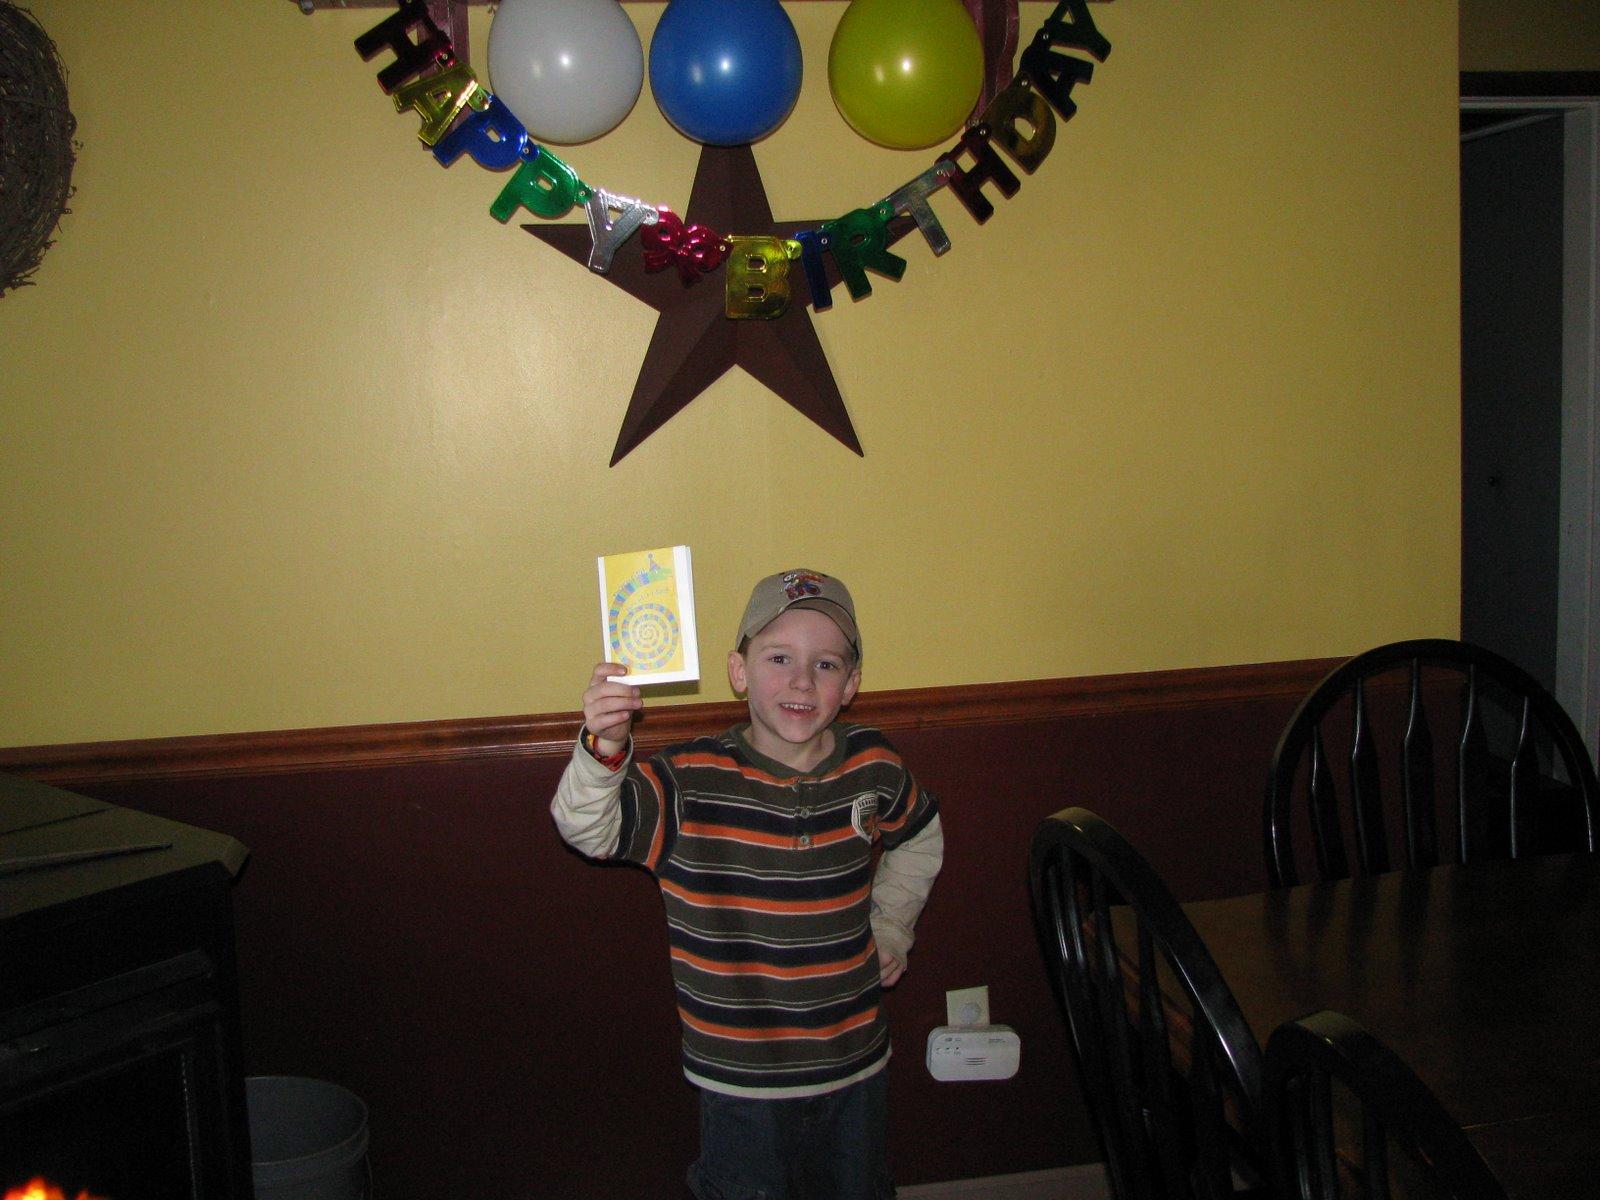 [caleb's+1st+birthday+card+in+the+mail.jpg]